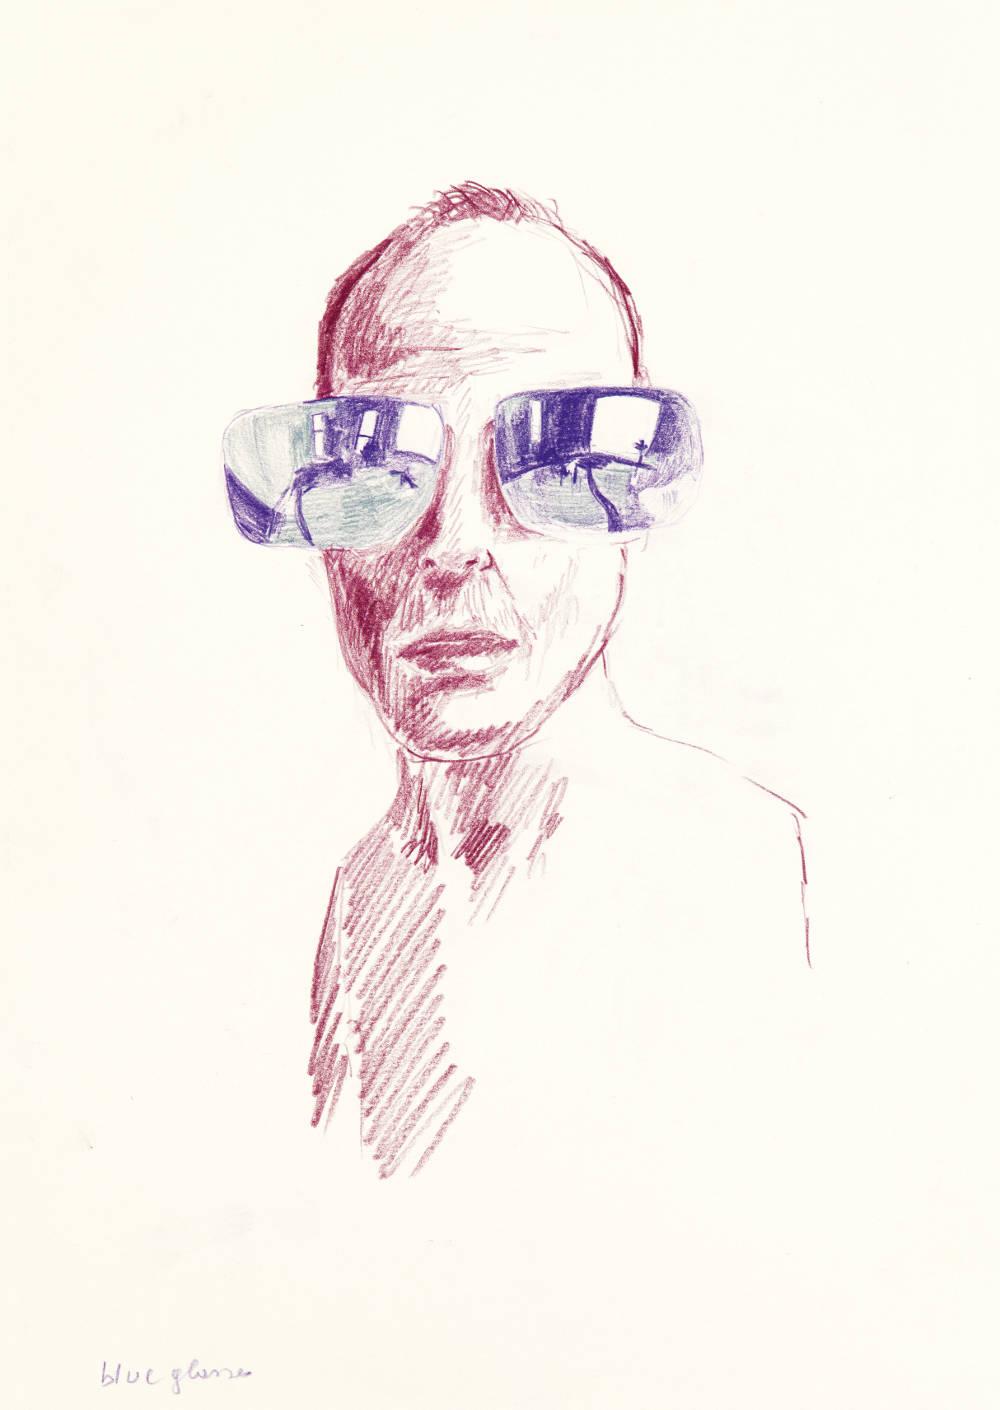 Erwin Wurm, Blue Glasses, 2016 – 2017. Selfportrait. Crayon on paper 42 x 29.7 cm